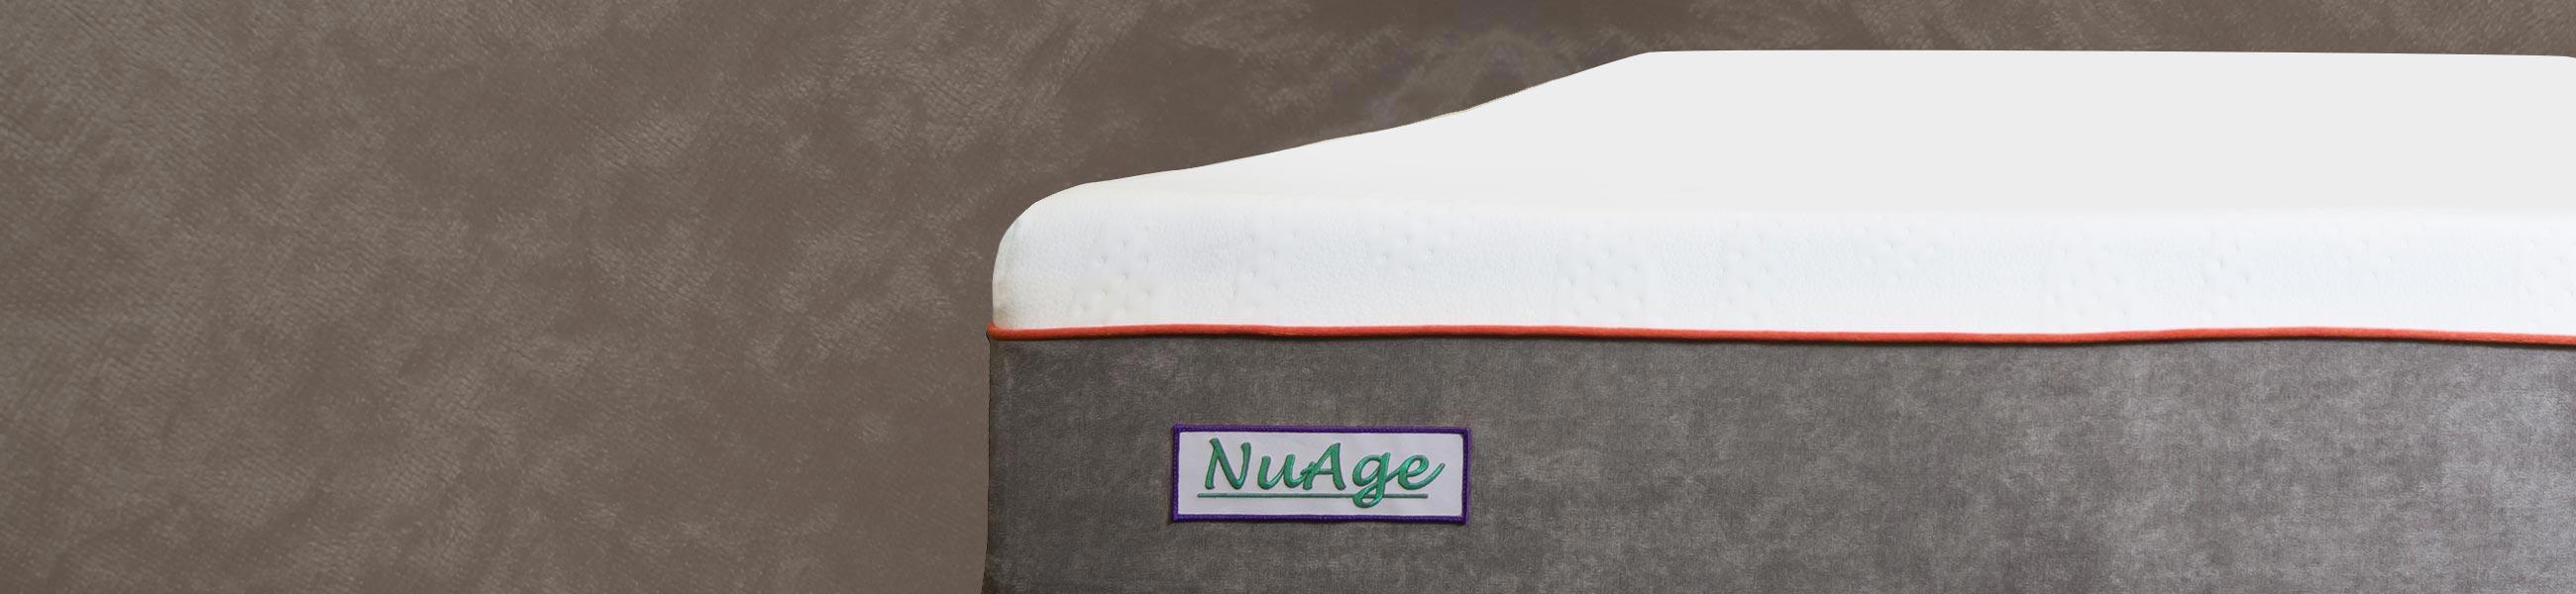 foam-mattress-white-rock-mattresses